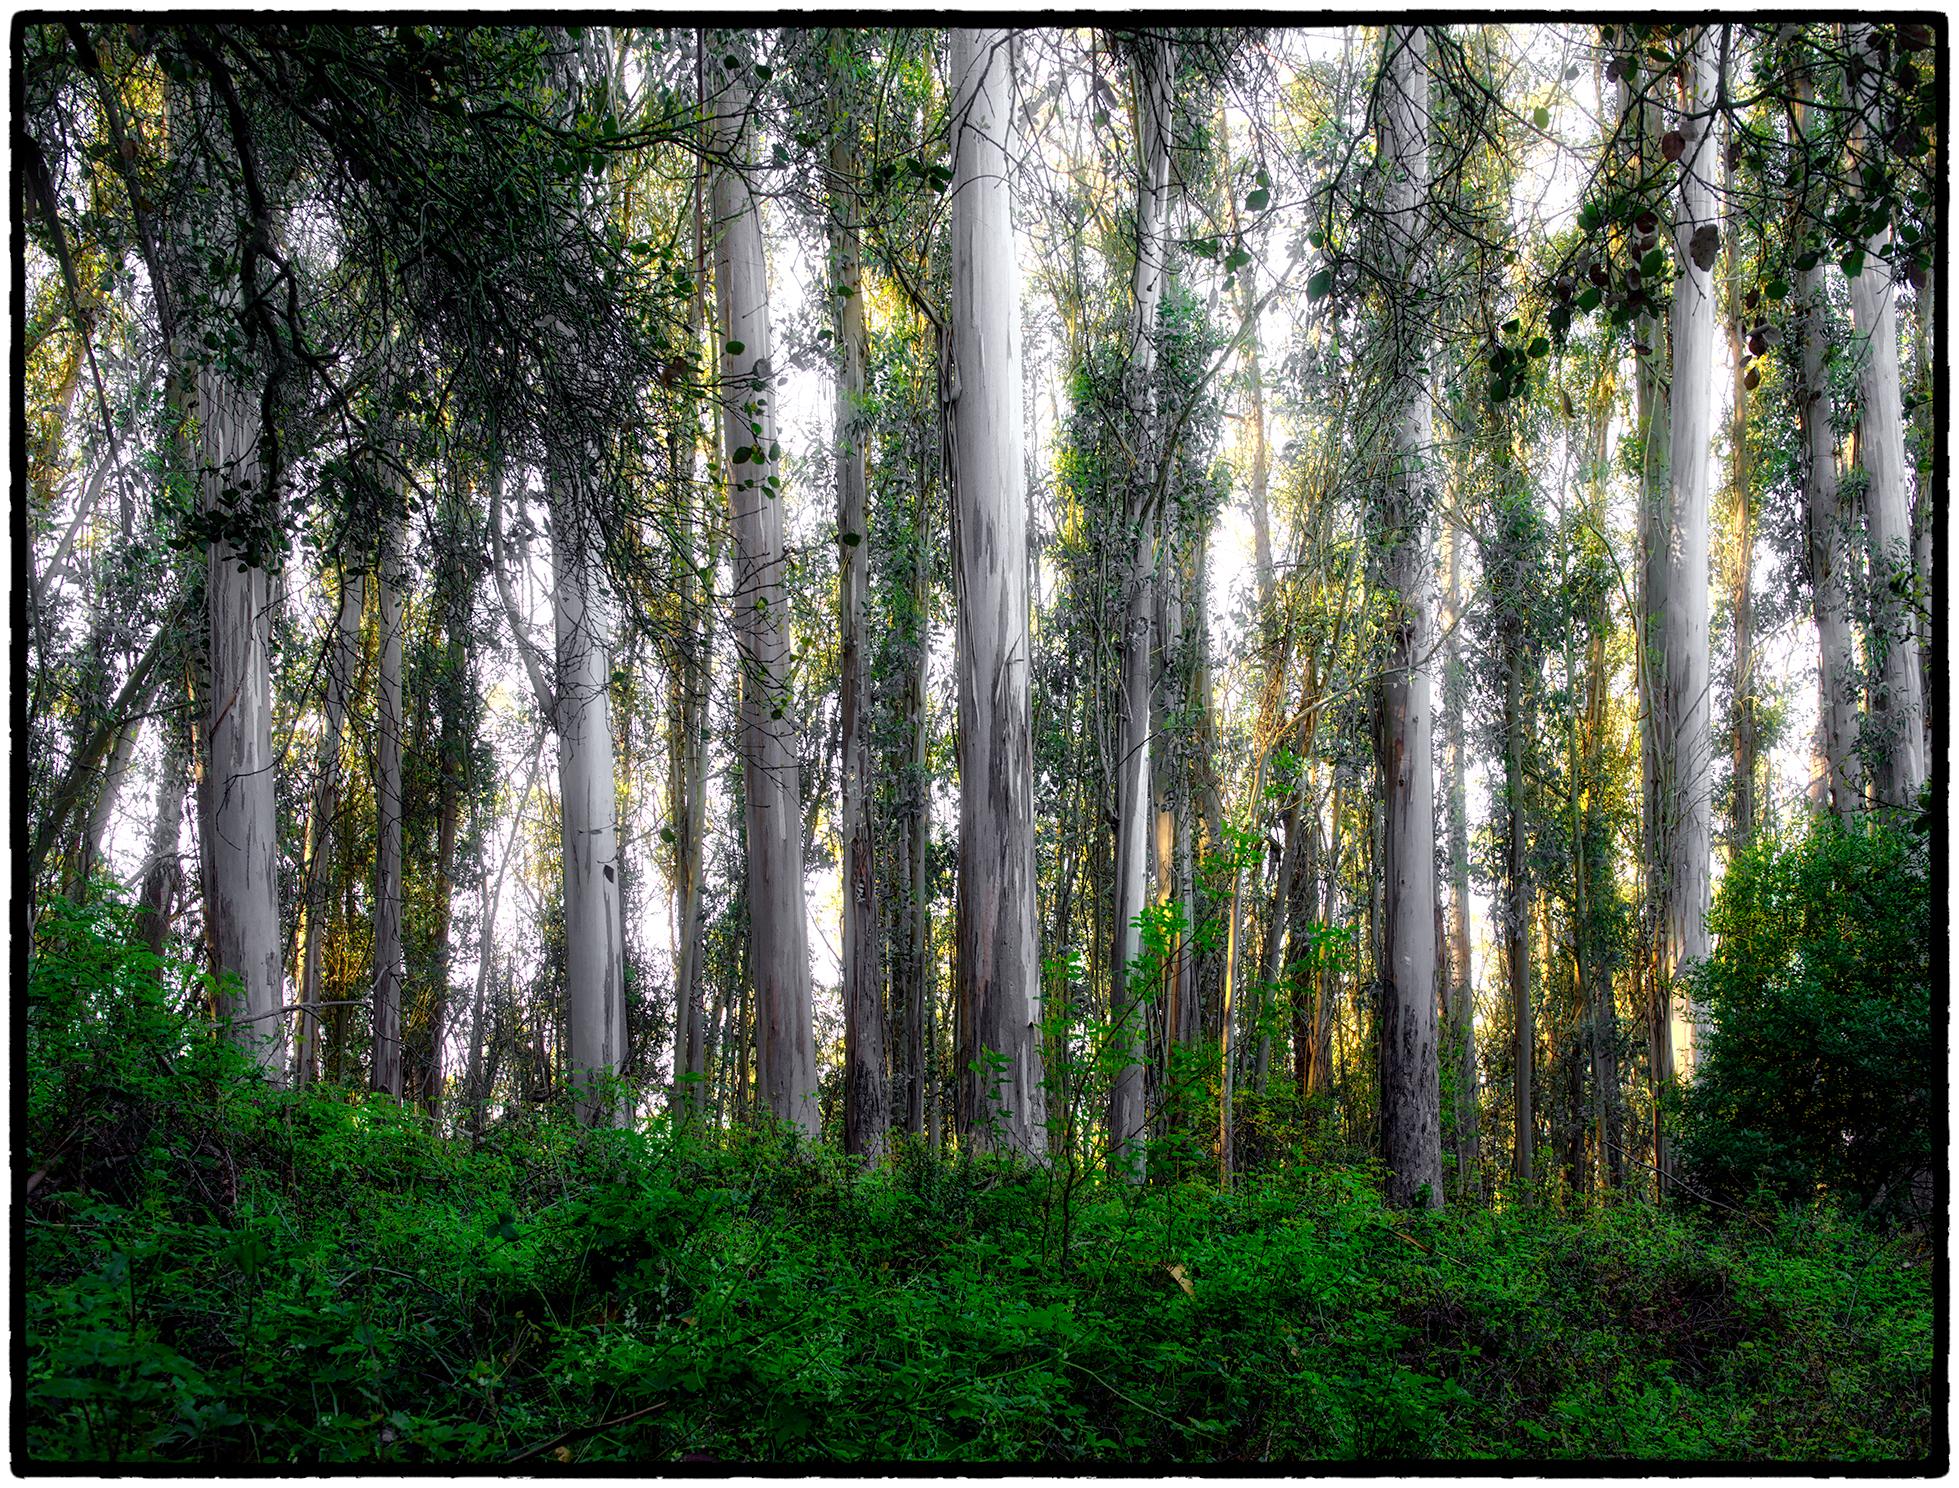 Eucalyptus Forest, Tilden Park, Berkeley, CA